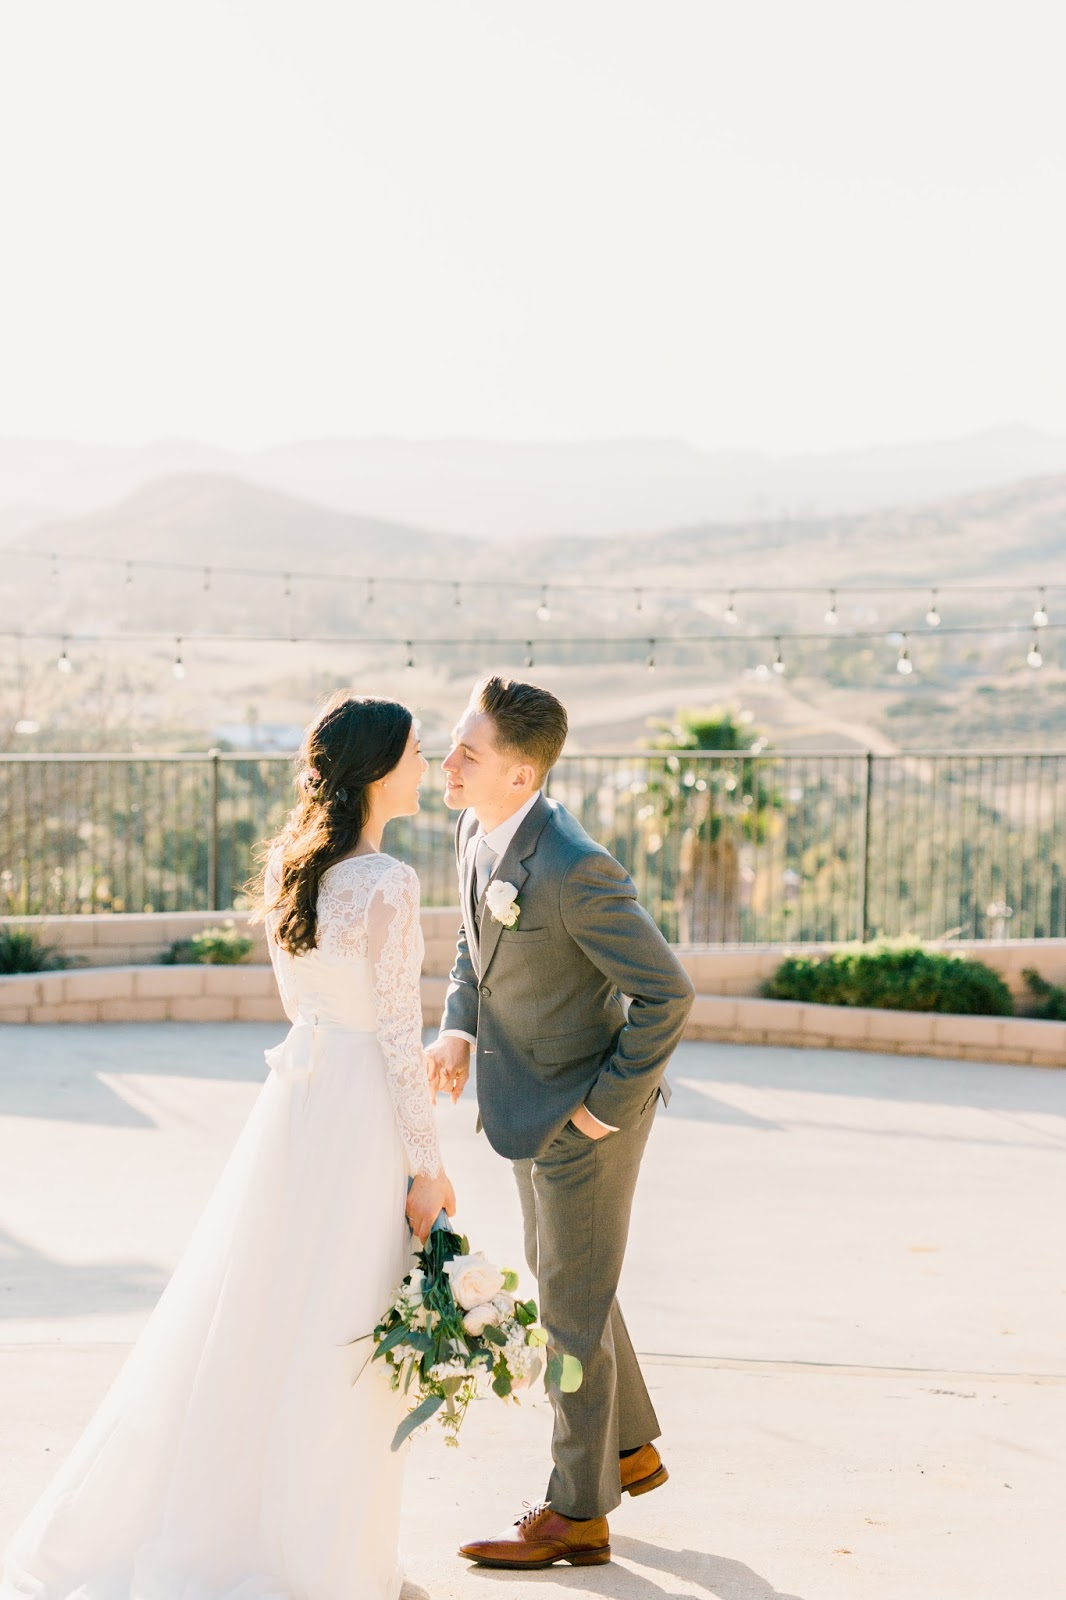 Cordiano Winery-Romantic Vineyard Wedding-Boho Bride-San Diego Photographer-Something Minted Photography